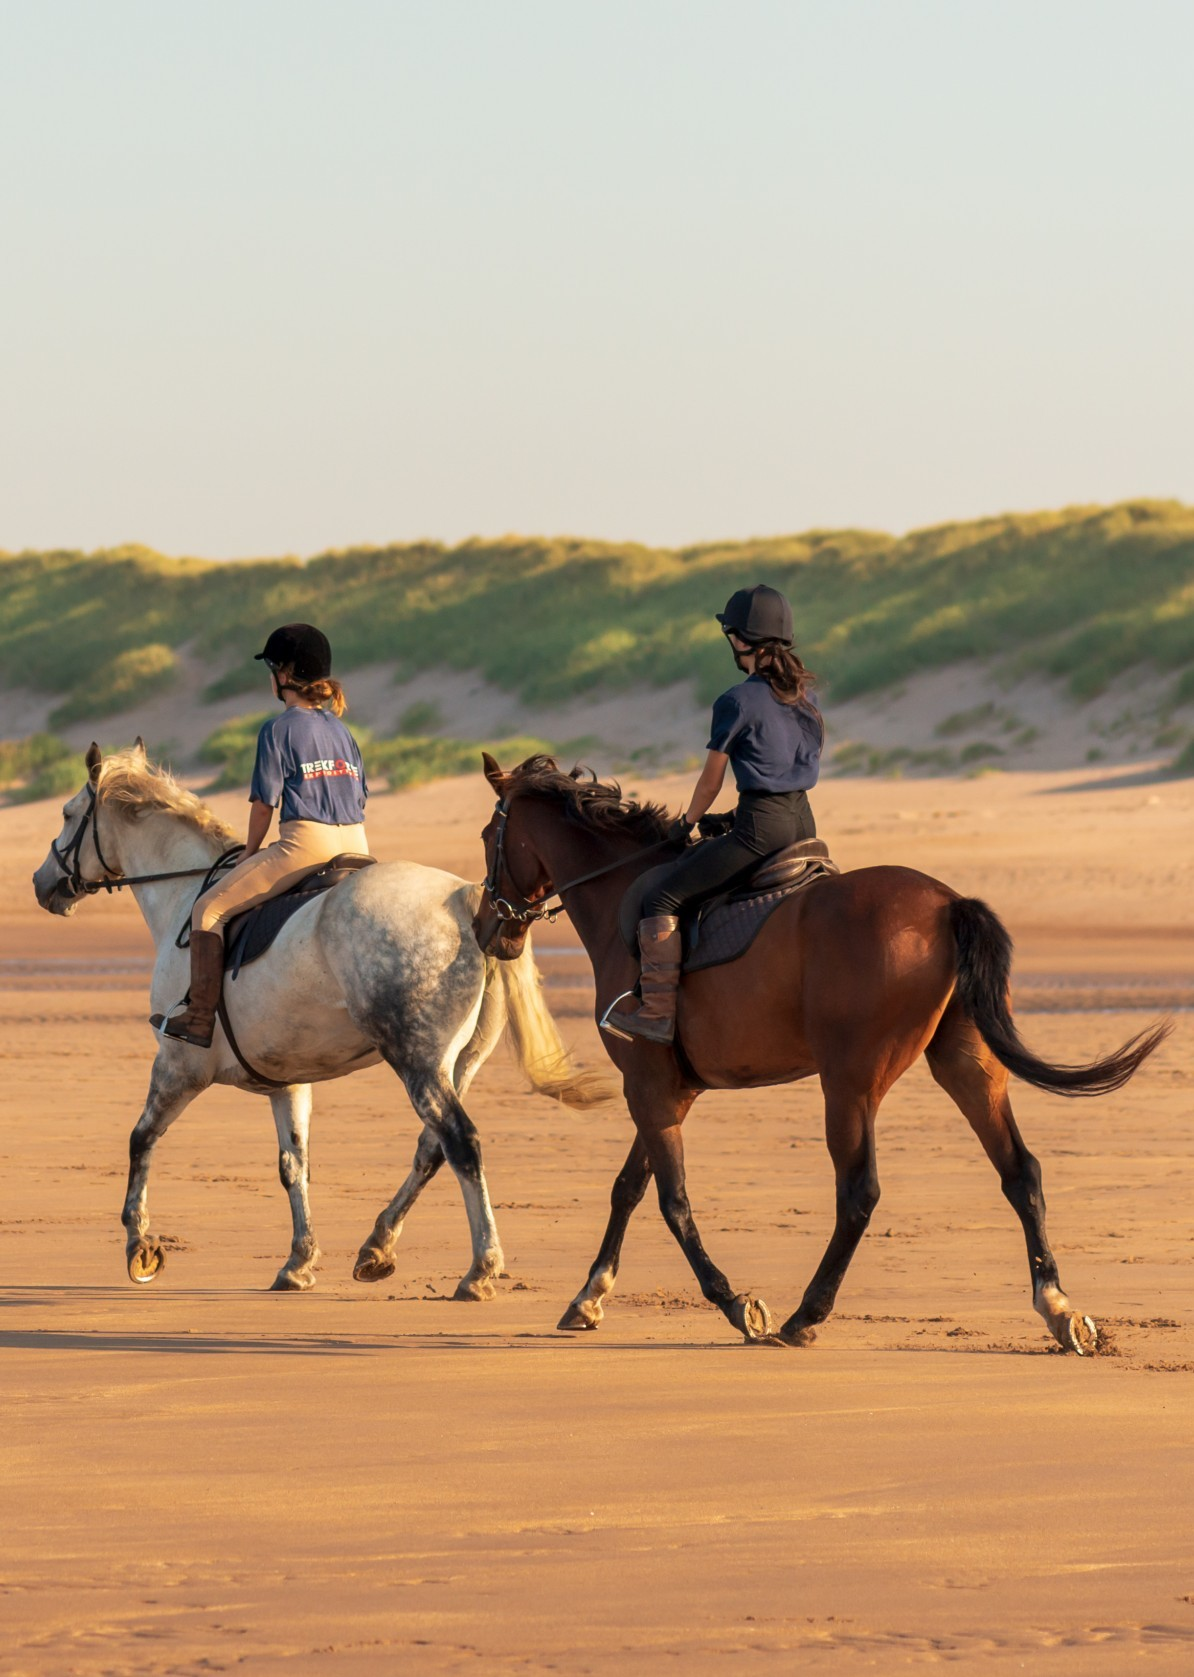 Horse Riders 9 Scaled Aspect Ratio 311x437